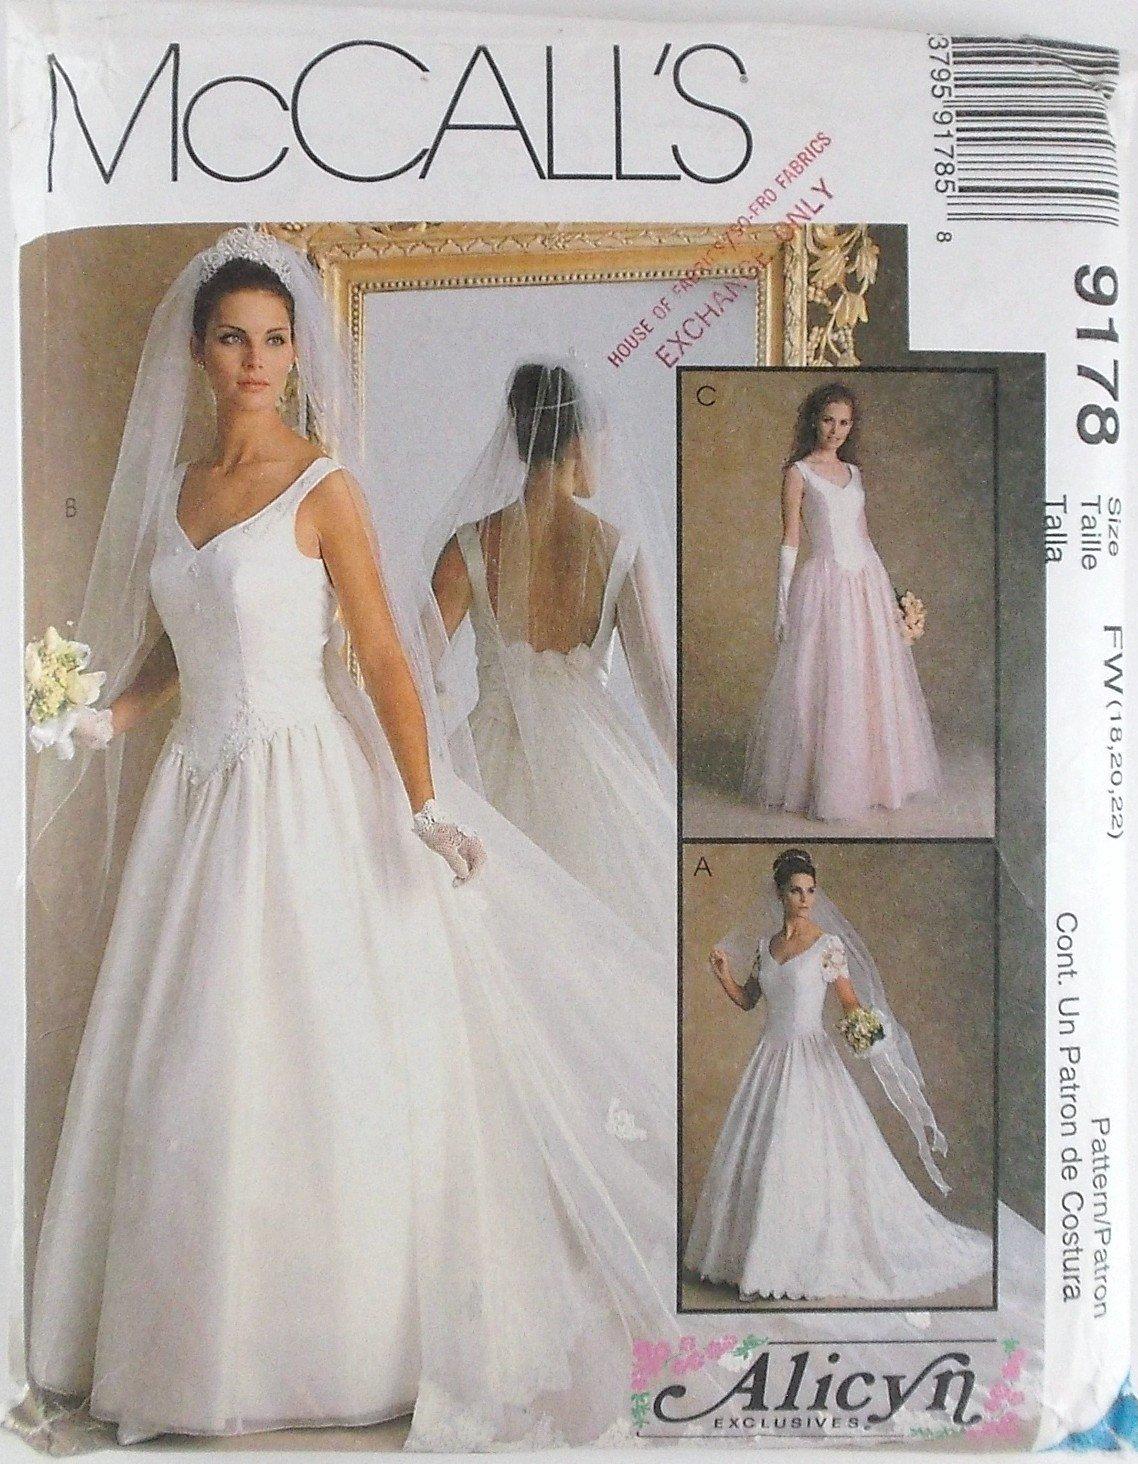 Wedding Dress Patterns Free Misses Bridal Gowns Dress Plus Sizes Mccalls Pattern 9178